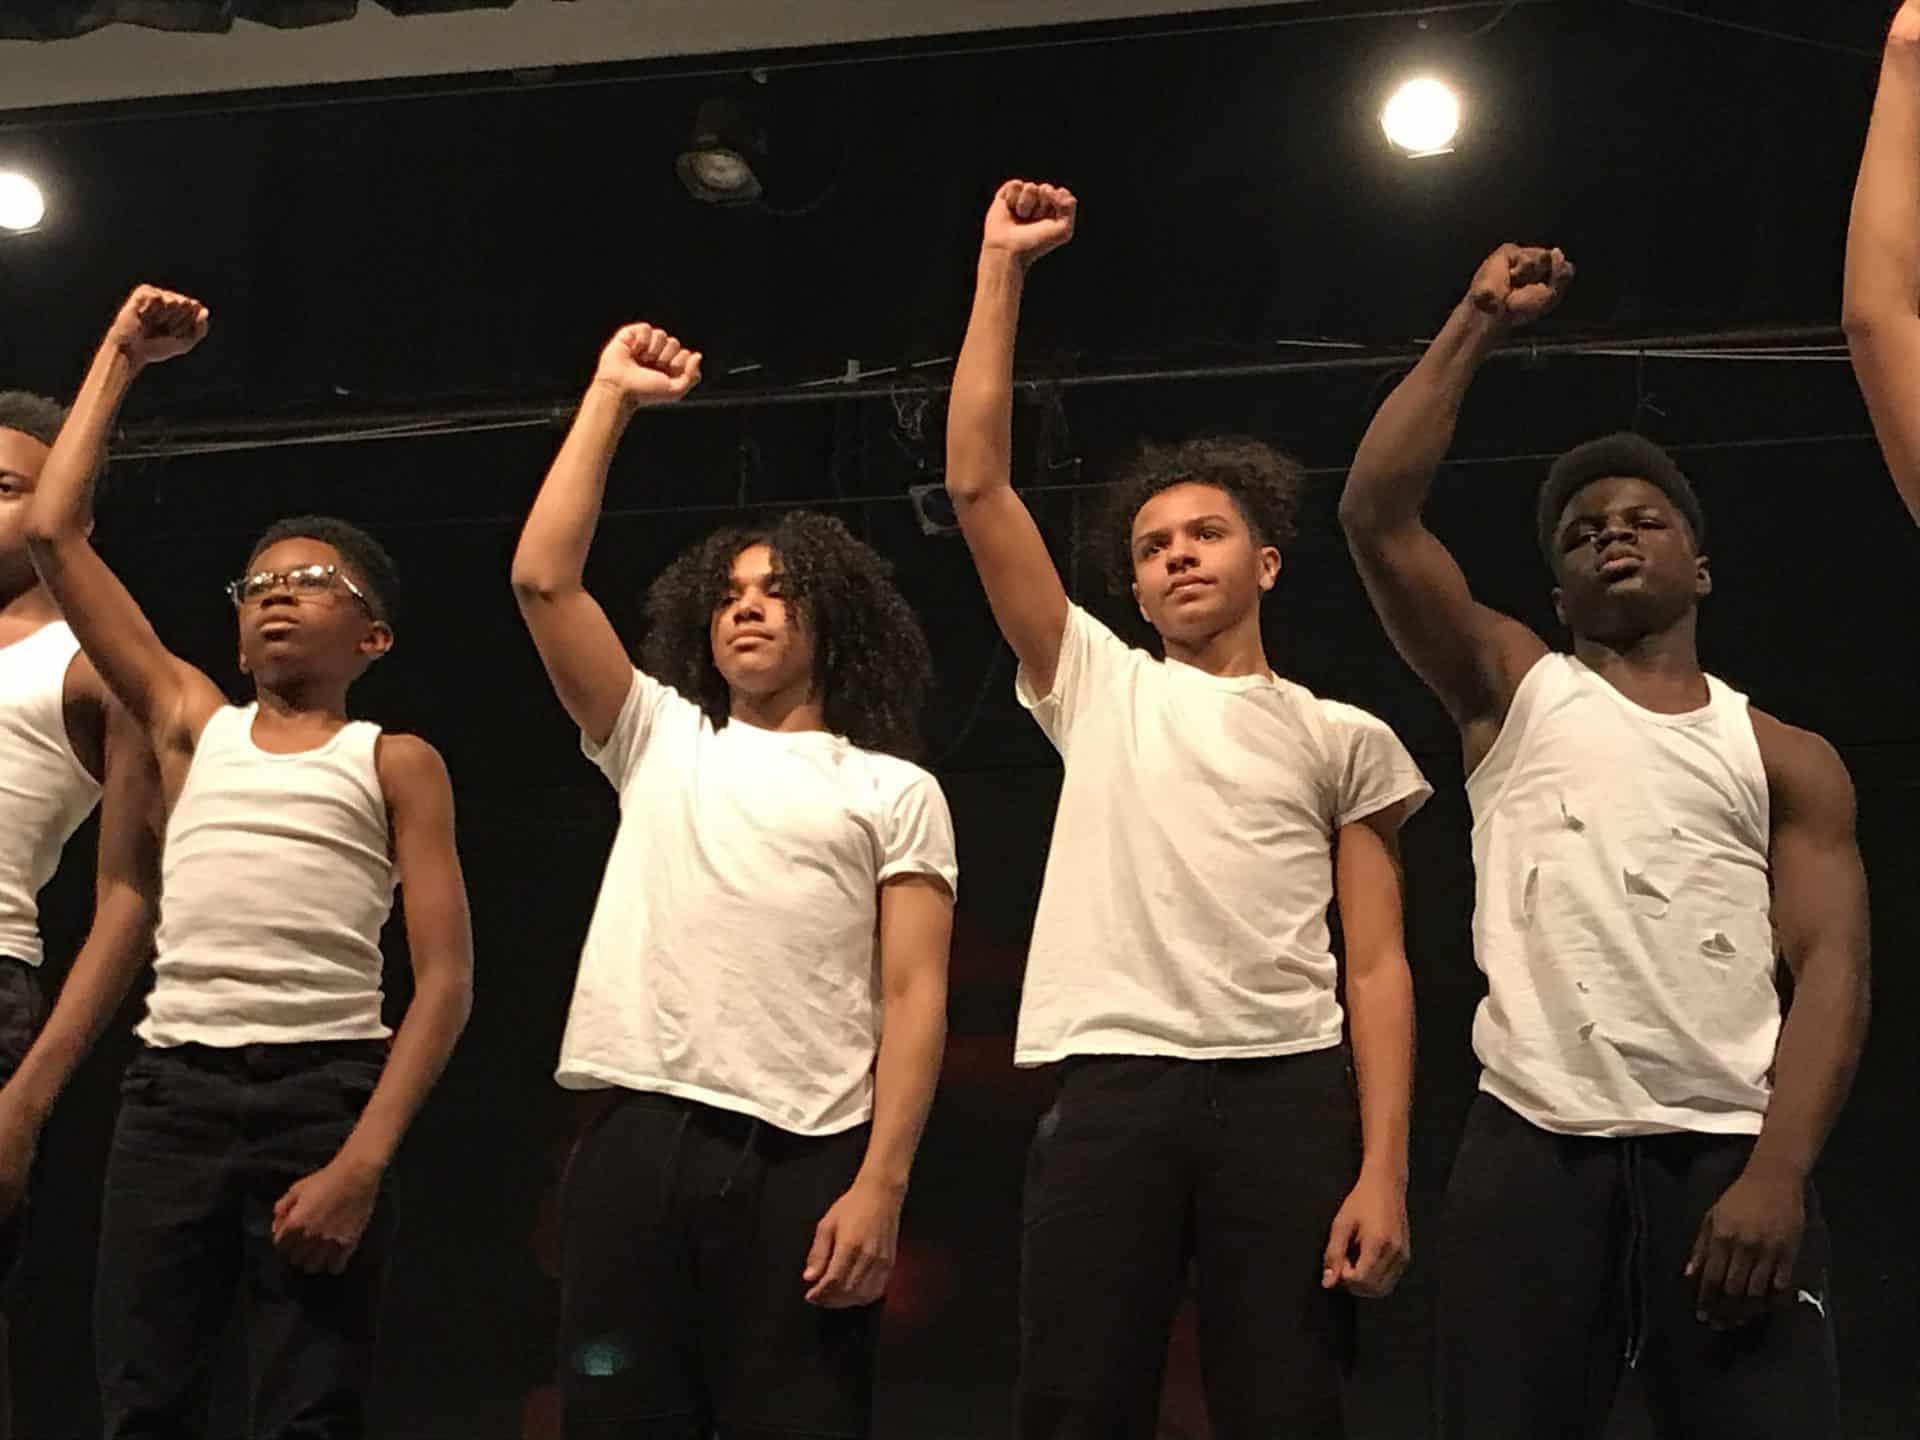 Franklin Middle School Boys Dance